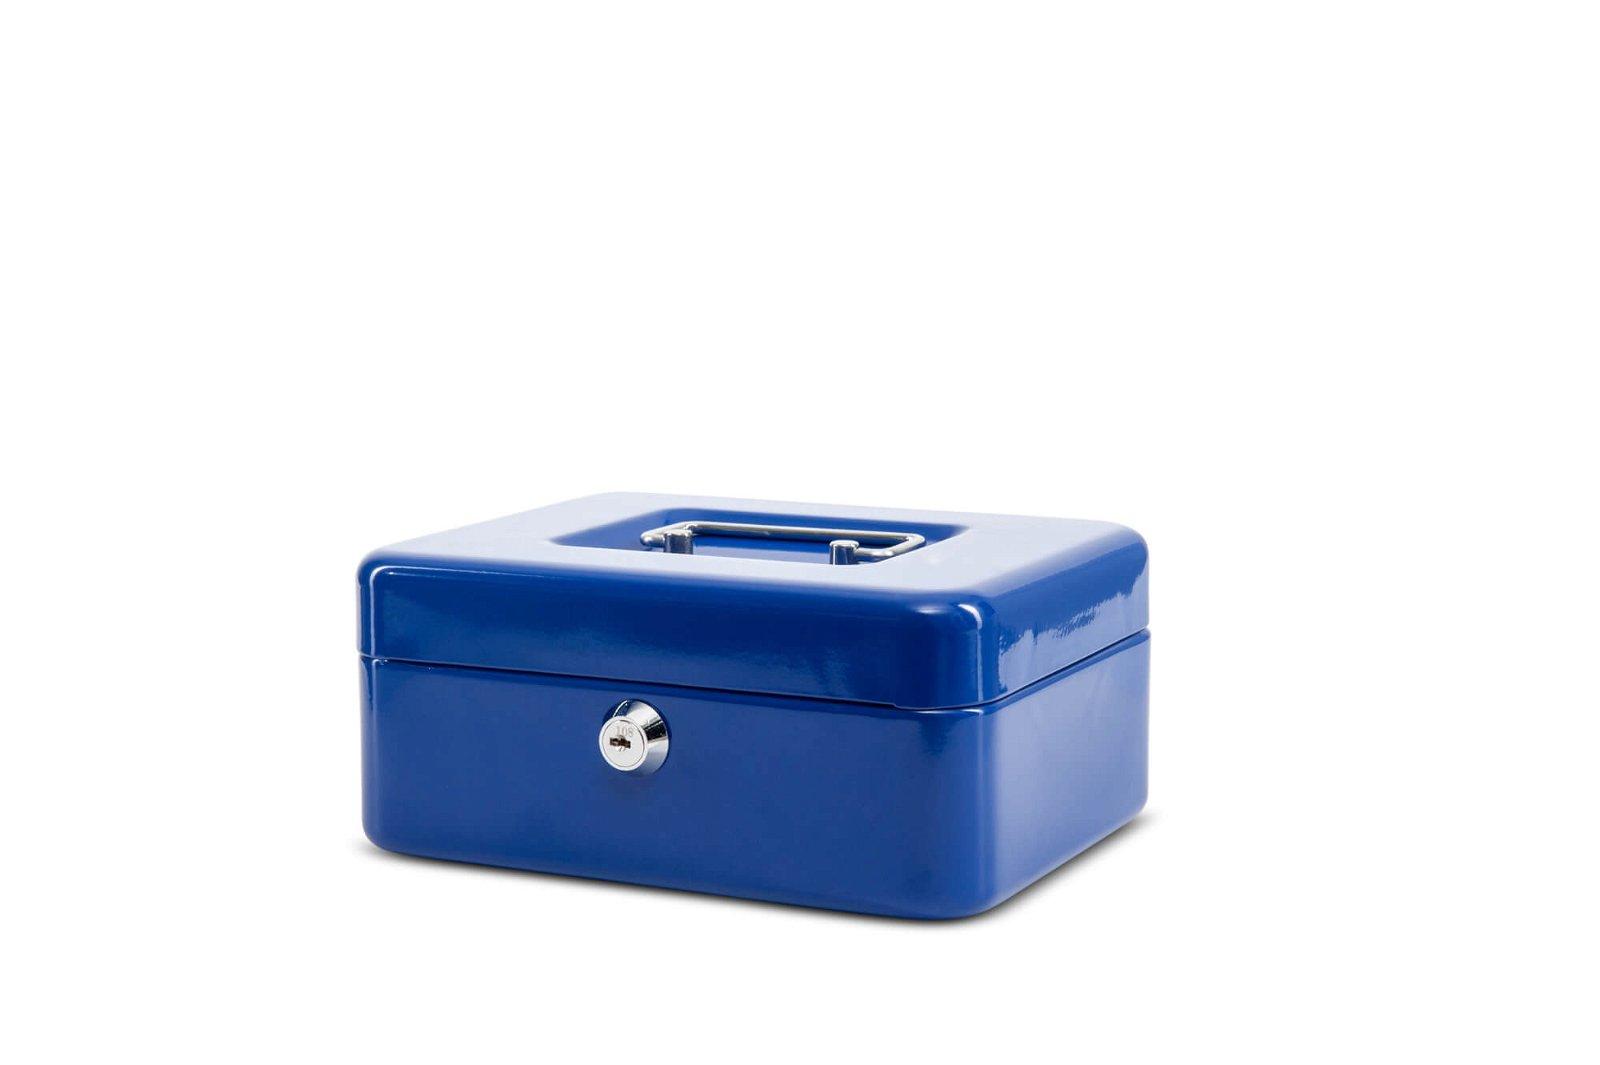 Geldkassette 2, 20 x 17 x 9 cm, blau